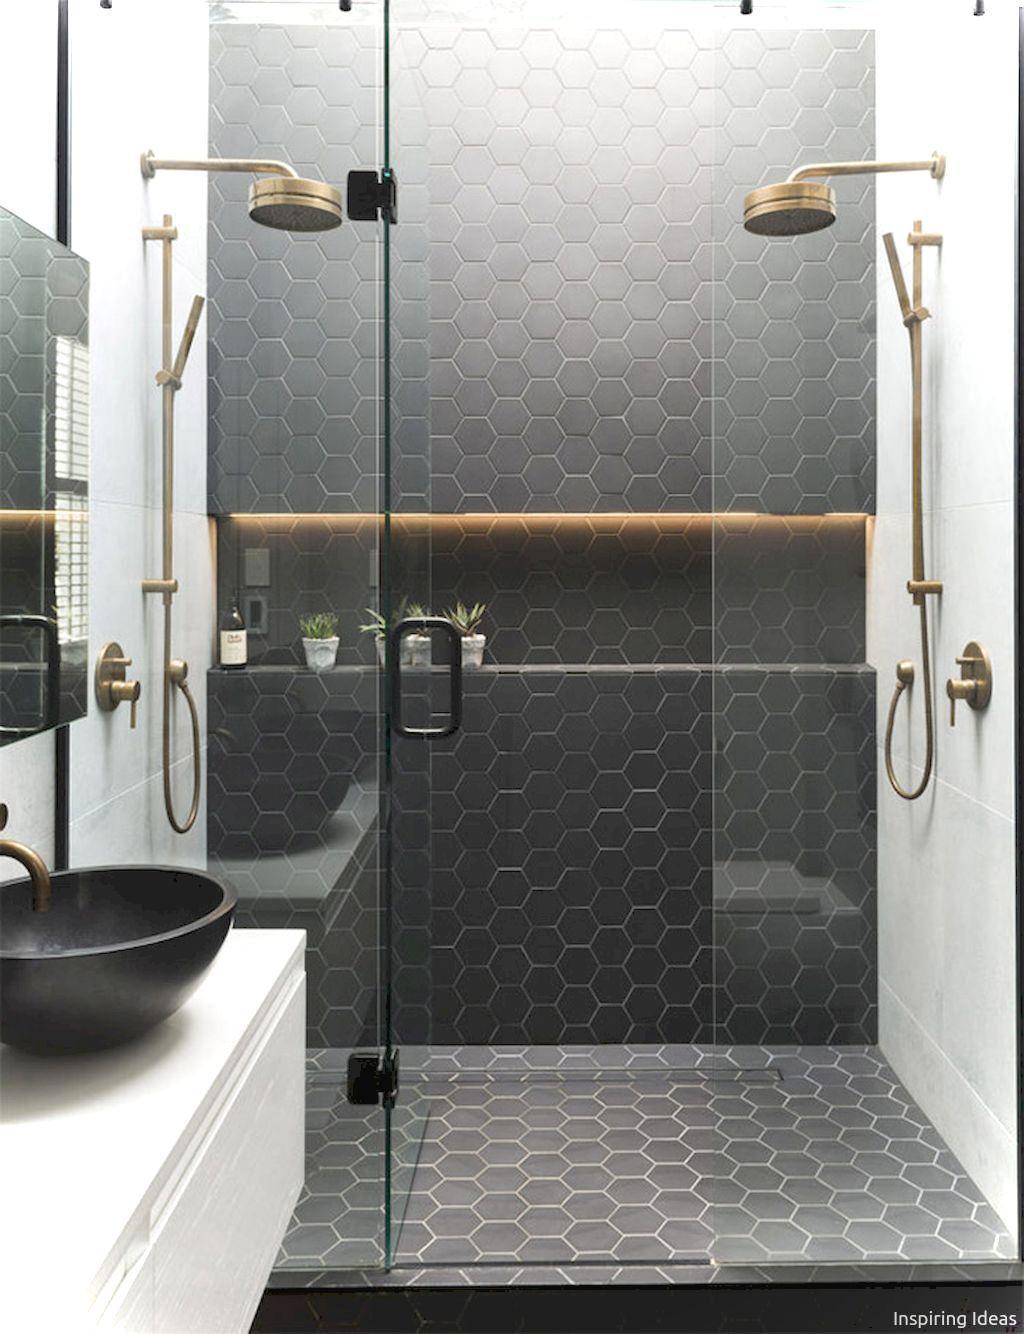 Adorable 100 Incredible Black and White Bathroom